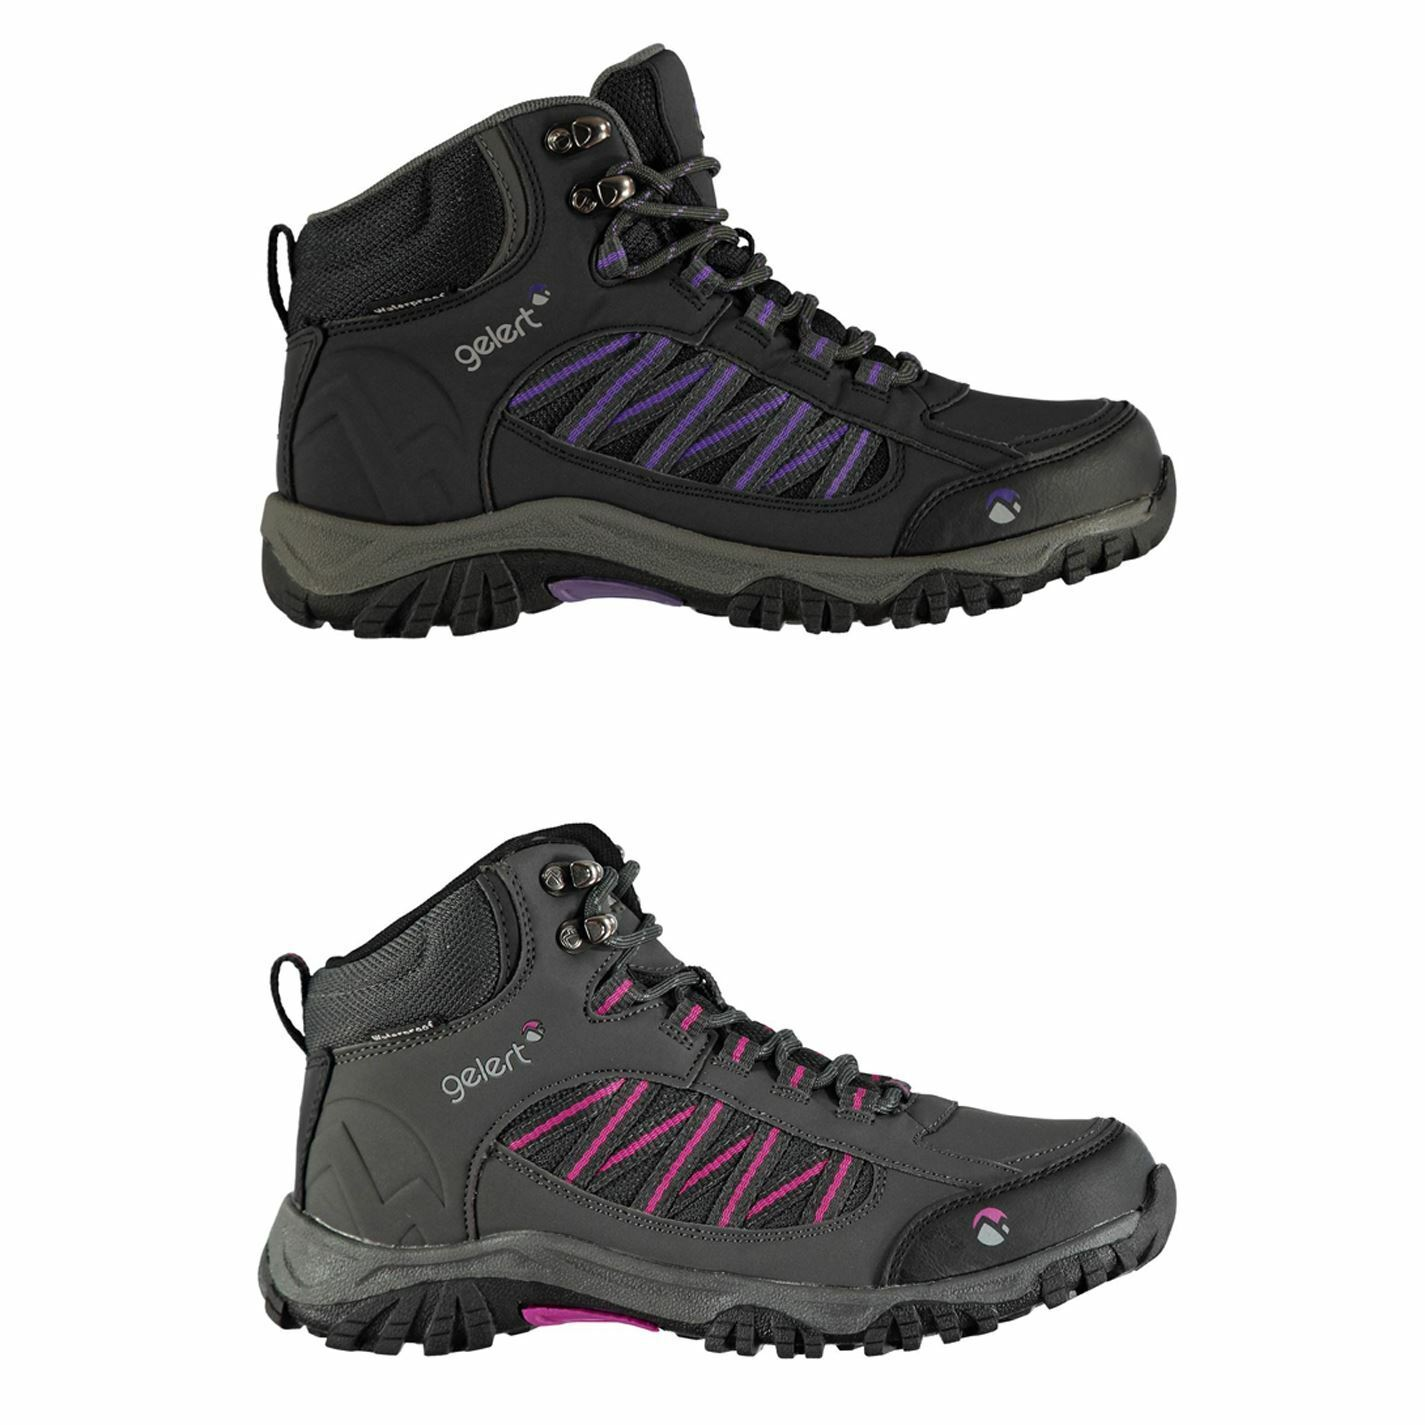 Gelert Horizon Mid Waterproof Walking Stiefel daSie Hiking Trekking schuhe